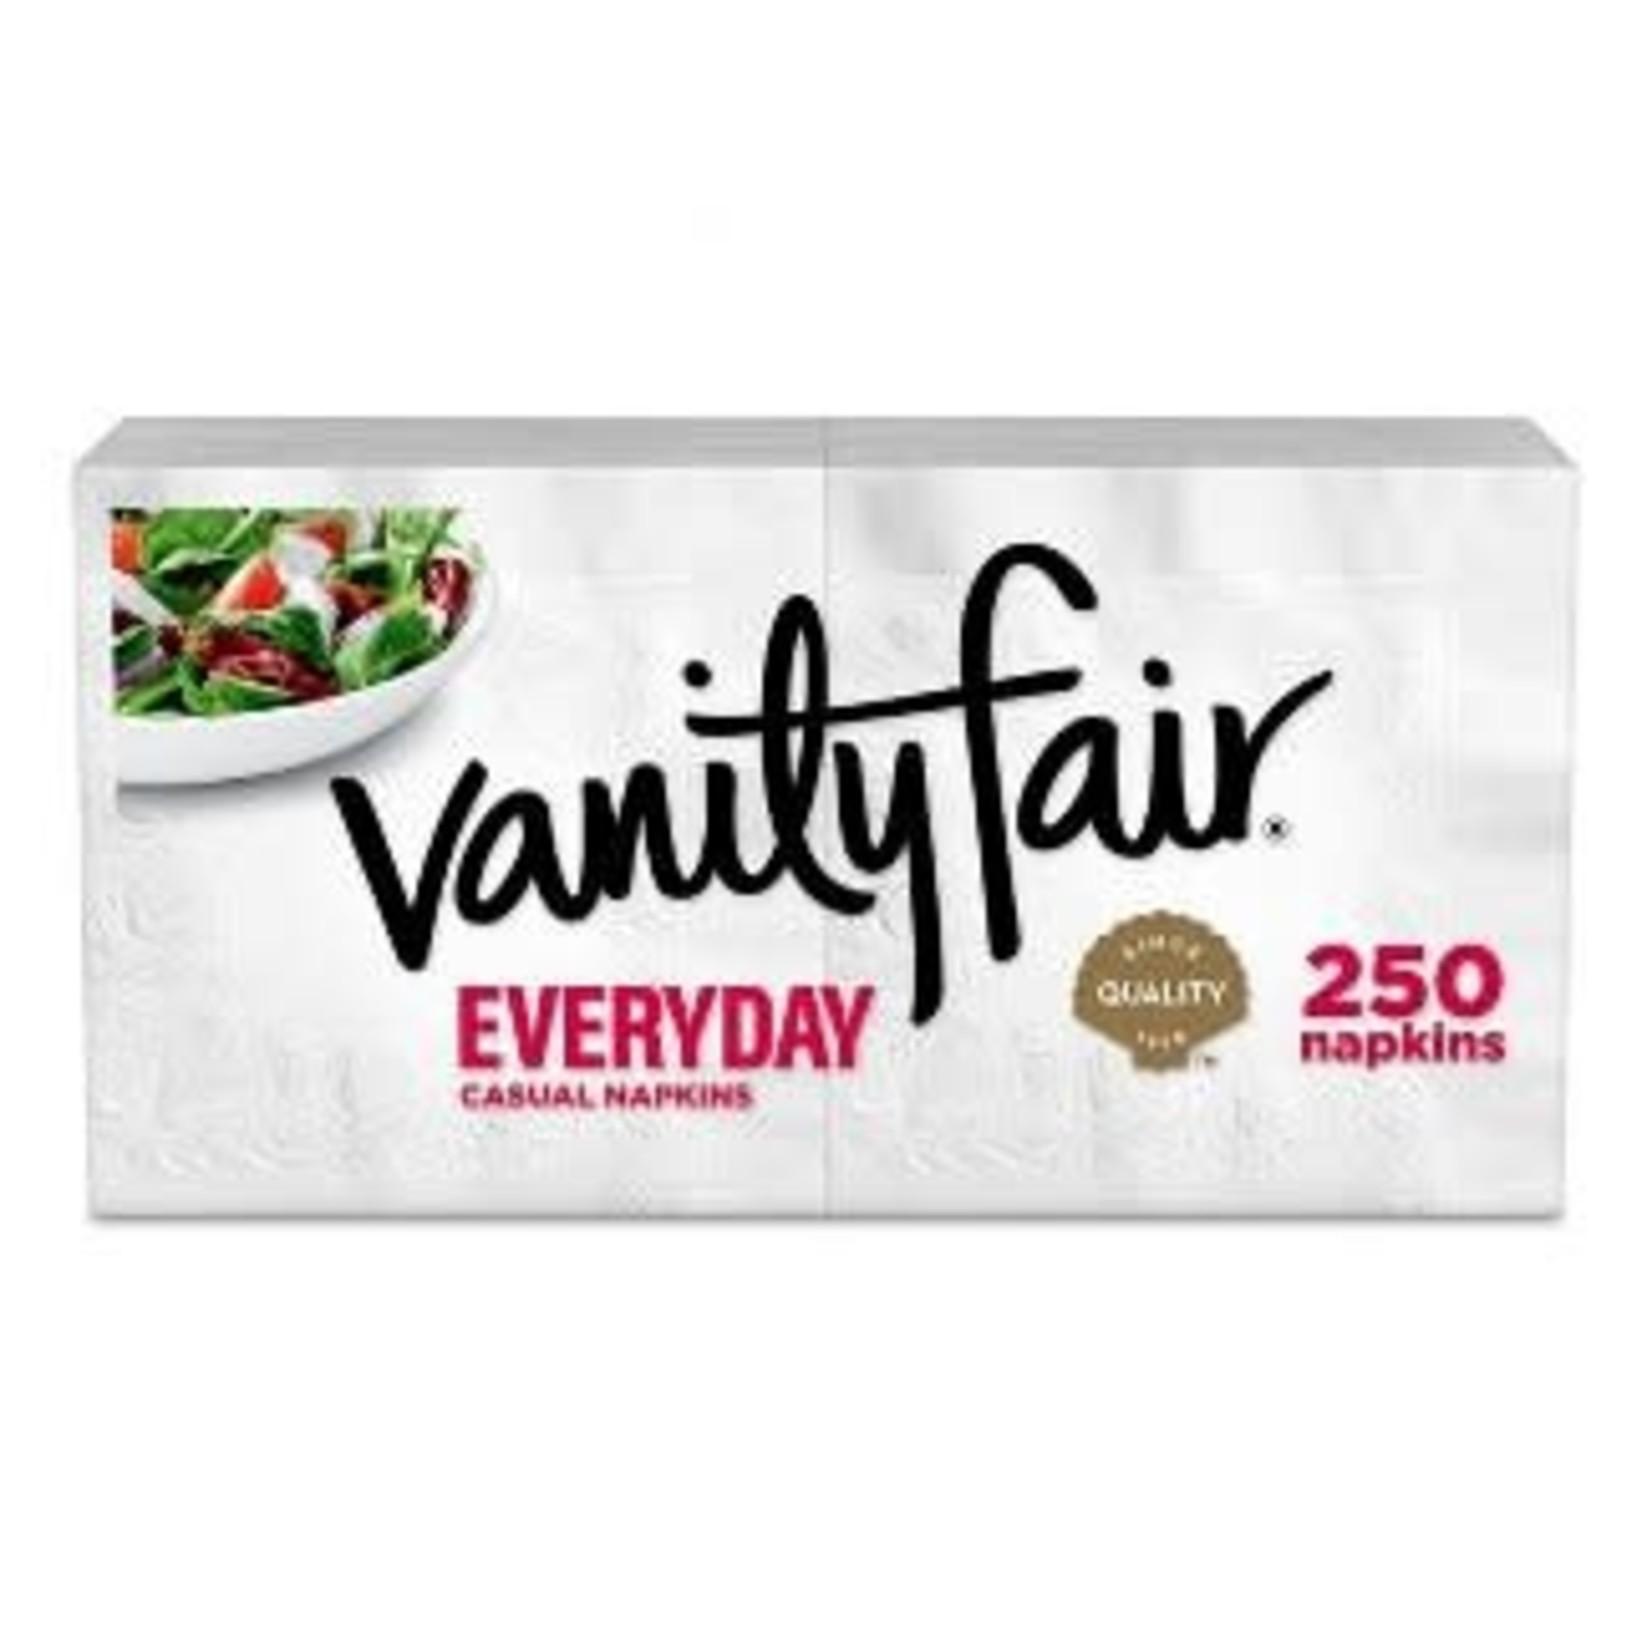 Vanity Fair Everyday White Napkins - 250ct